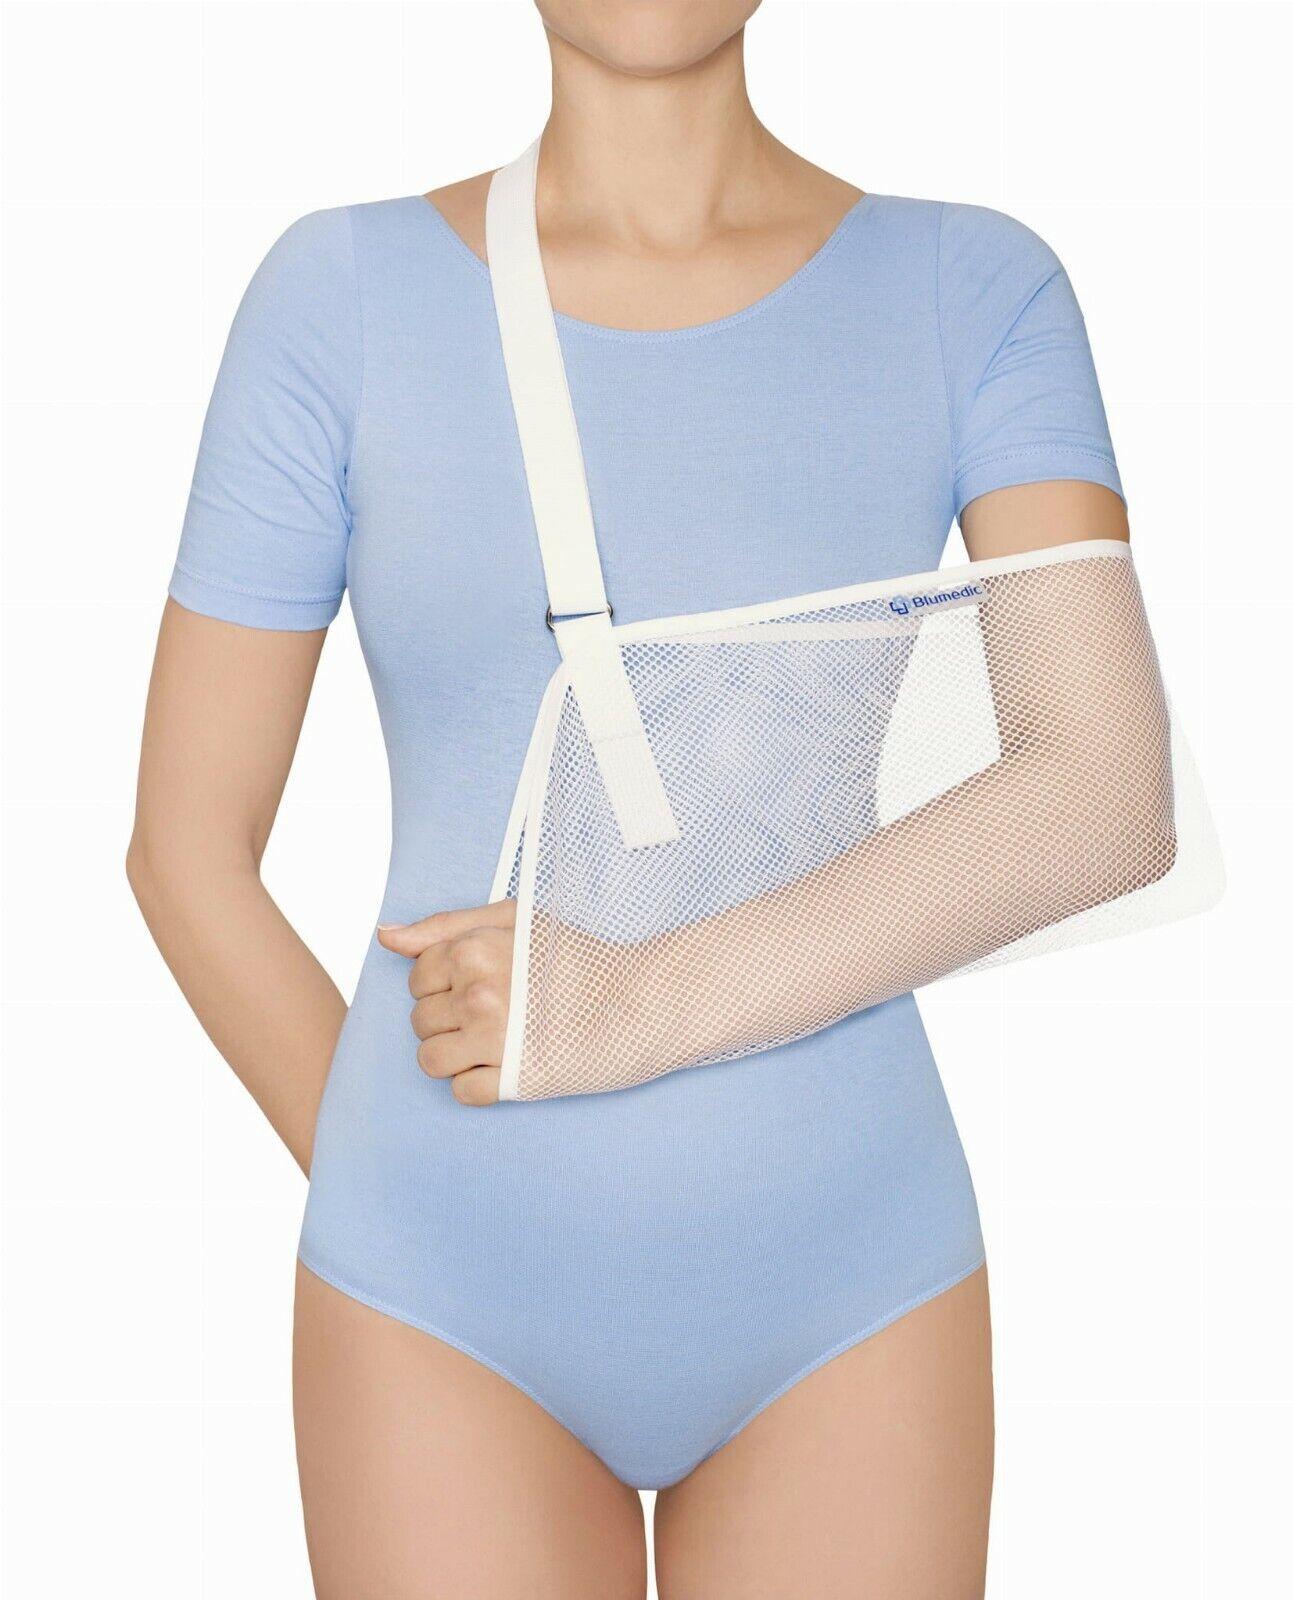 Armschlinge Armtragegurt Armbandage Armorthese  atmungsaktiv Gipsstütze weiß